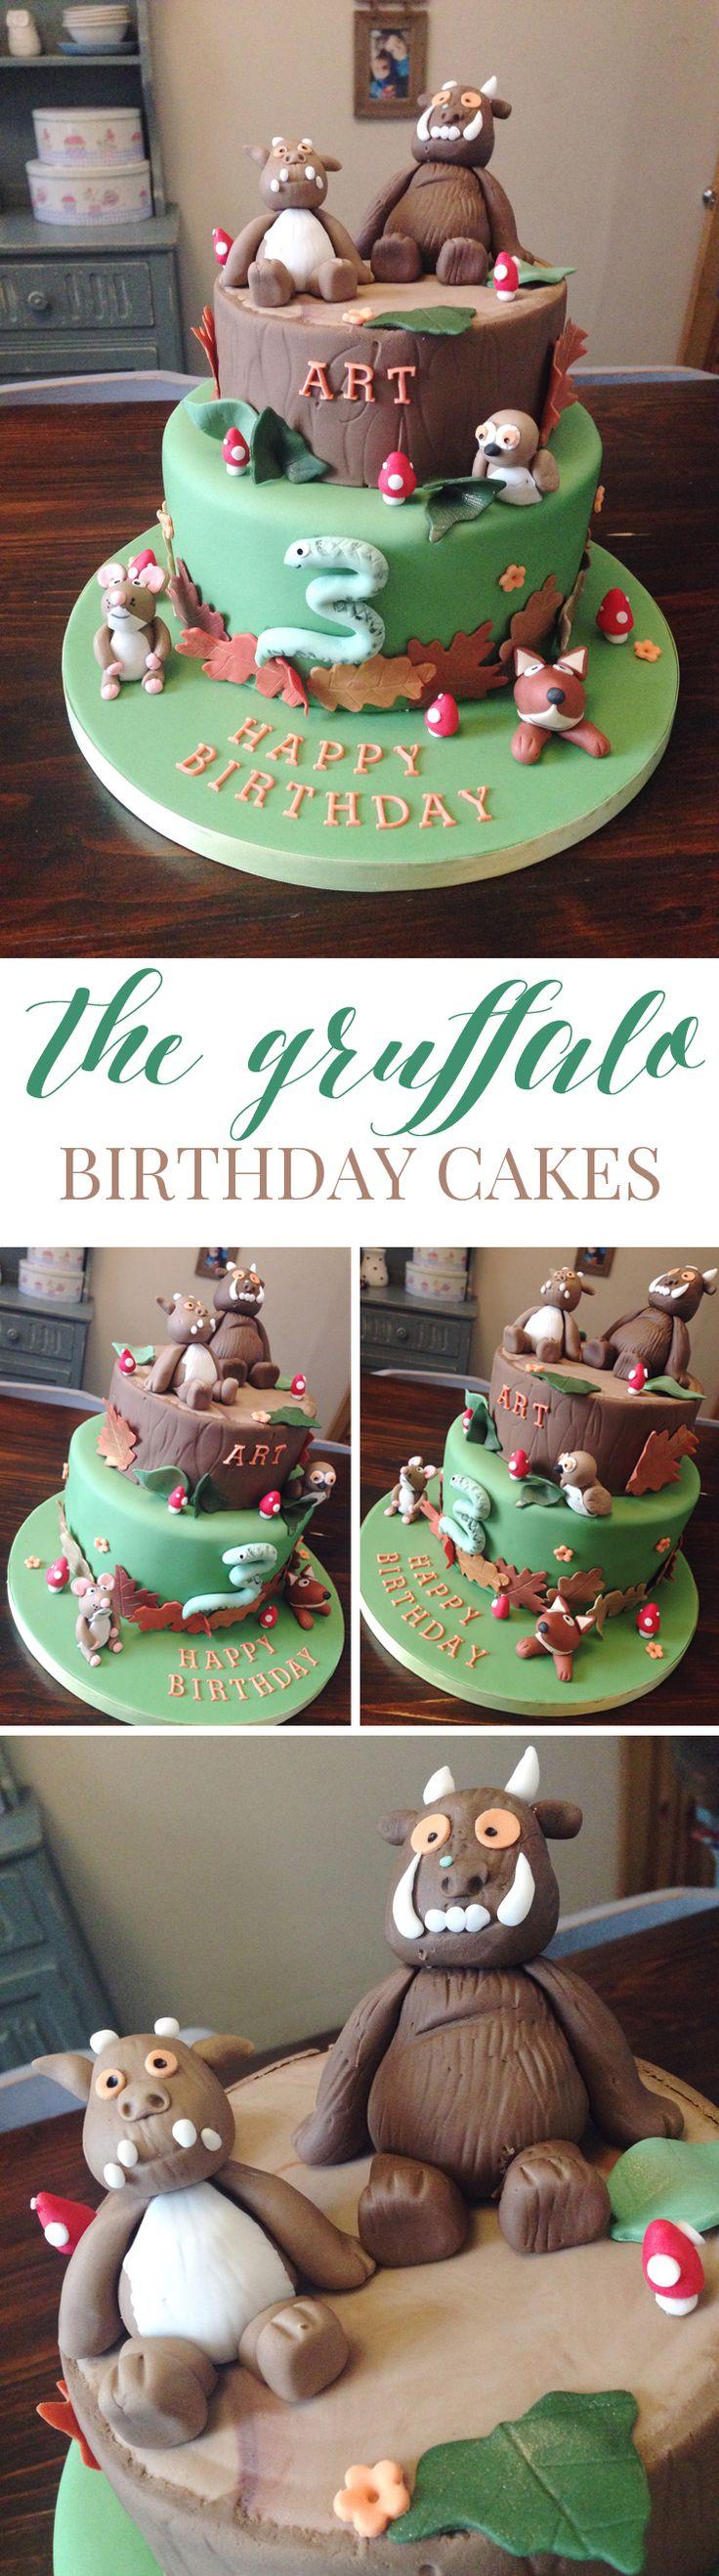 CAKE CLUB | THE GRUFFALO BIRTHDAY CAKES featuring all the characters, the Gruffalo & Gruffalo'sChild